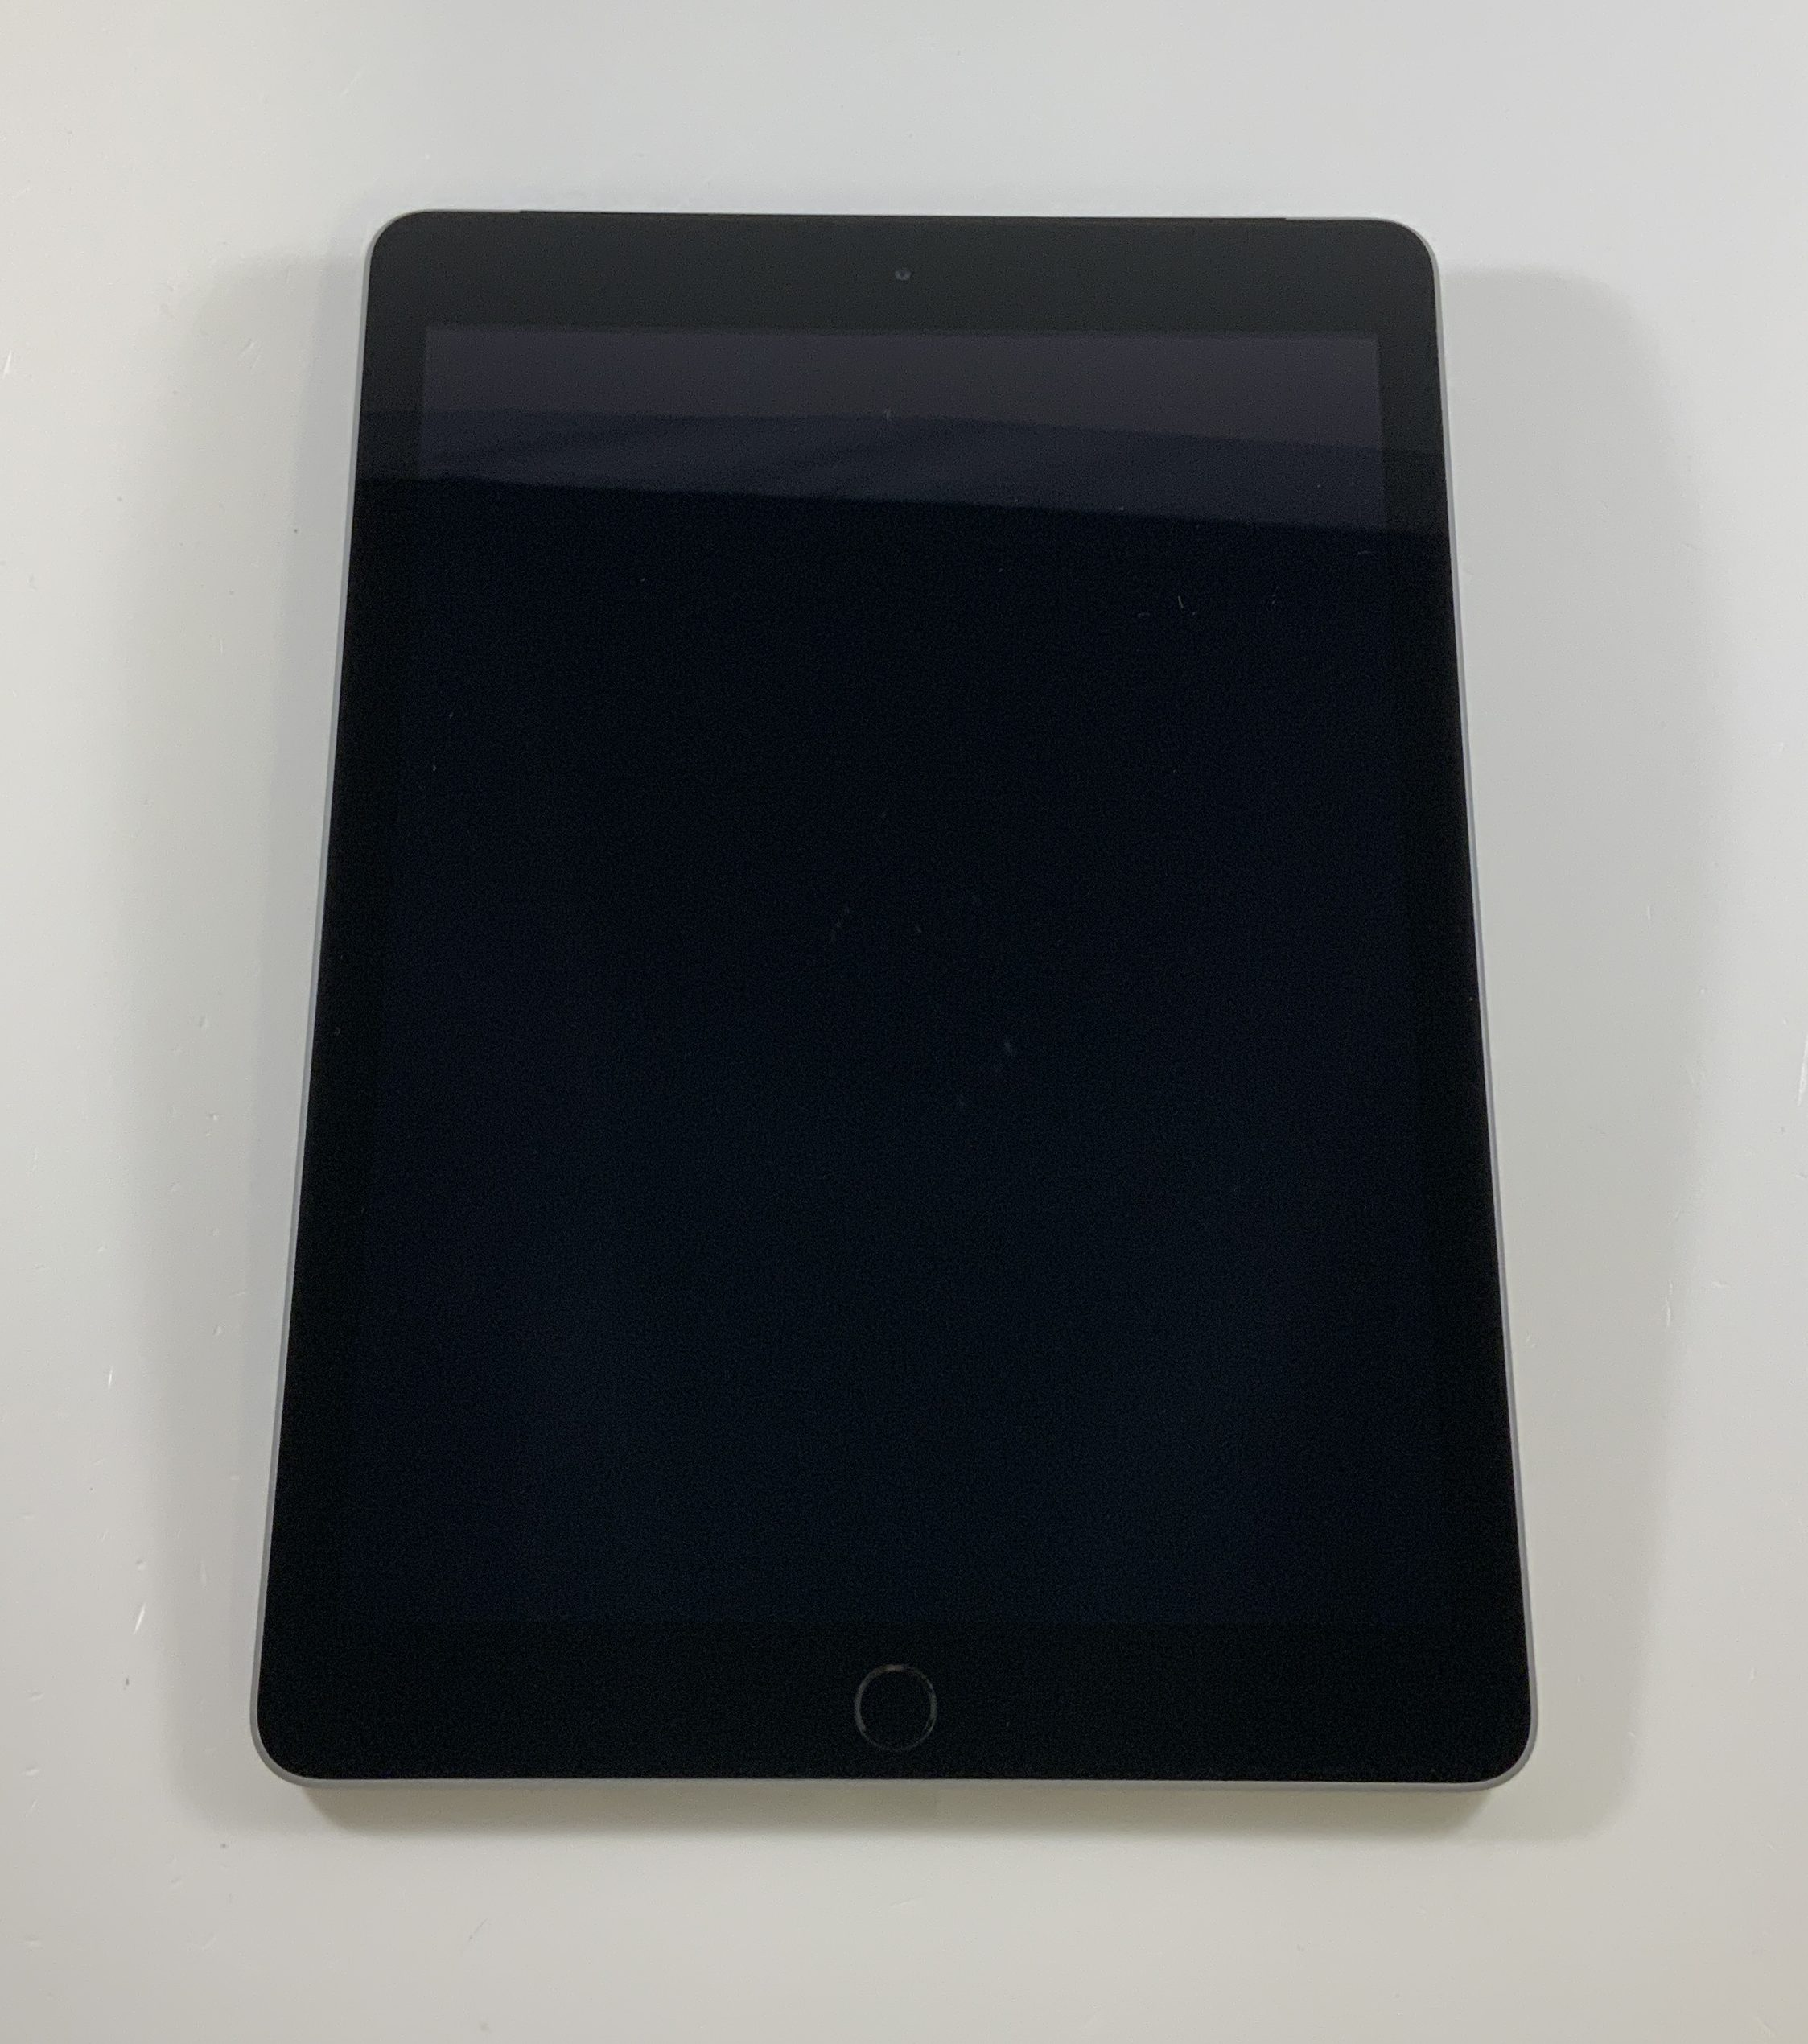 iPad 5 Wi-Fi + Cellular 128GB, 128GB, Space Gray, Kuva 1